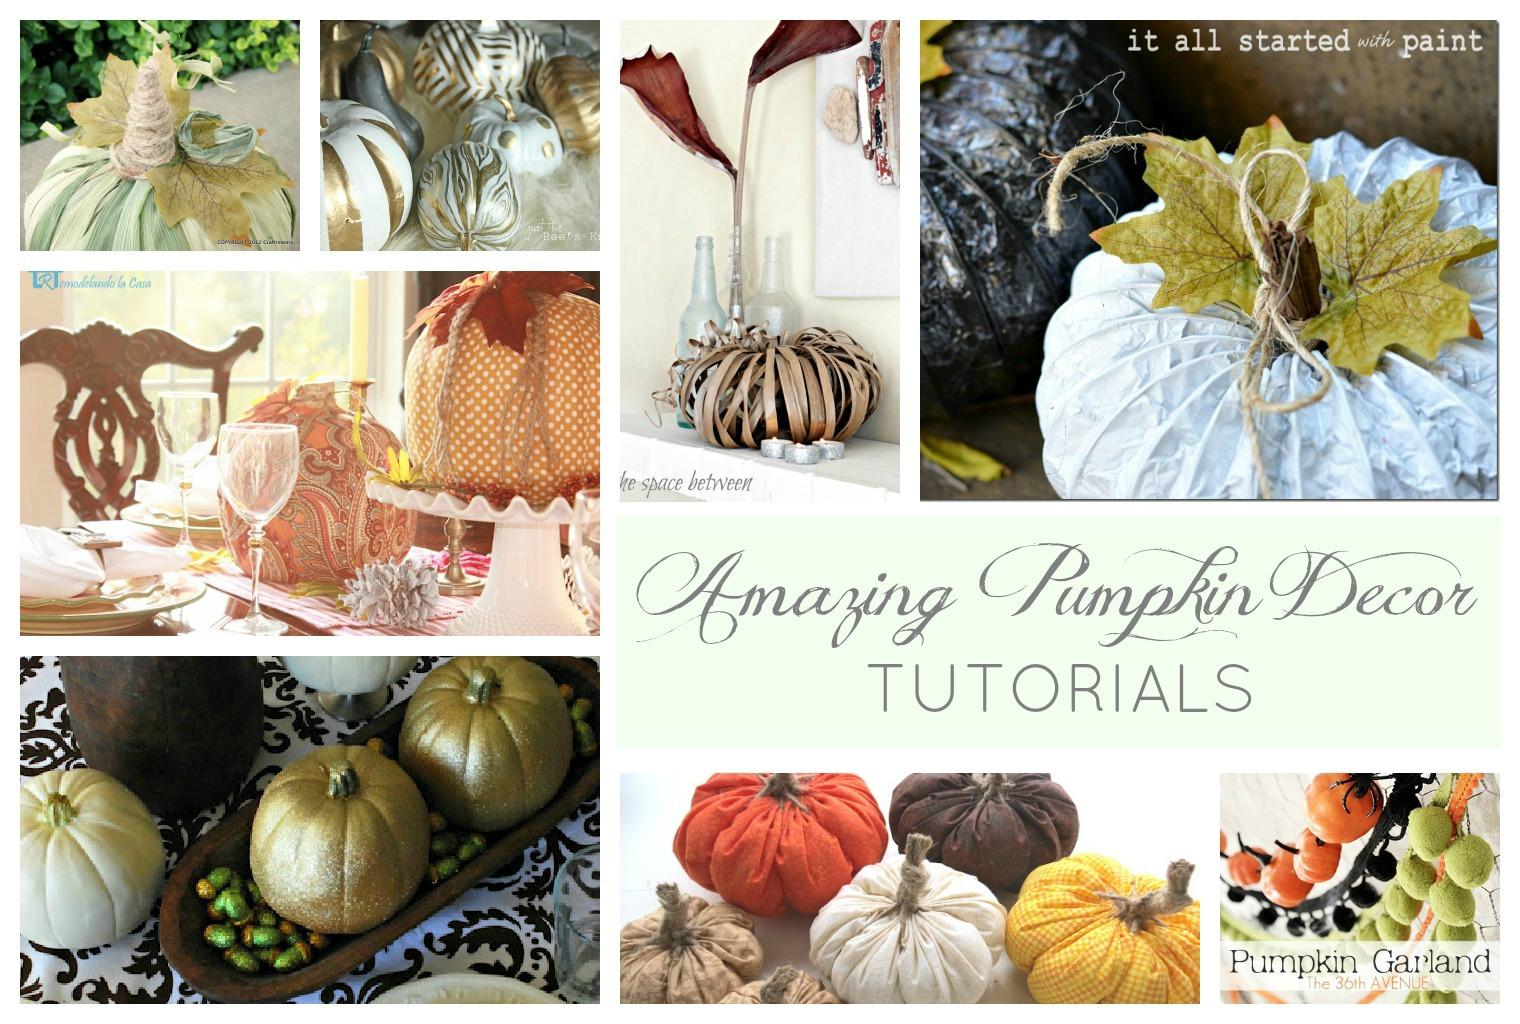 Nine Amazing Pumpkin Decor Ideas